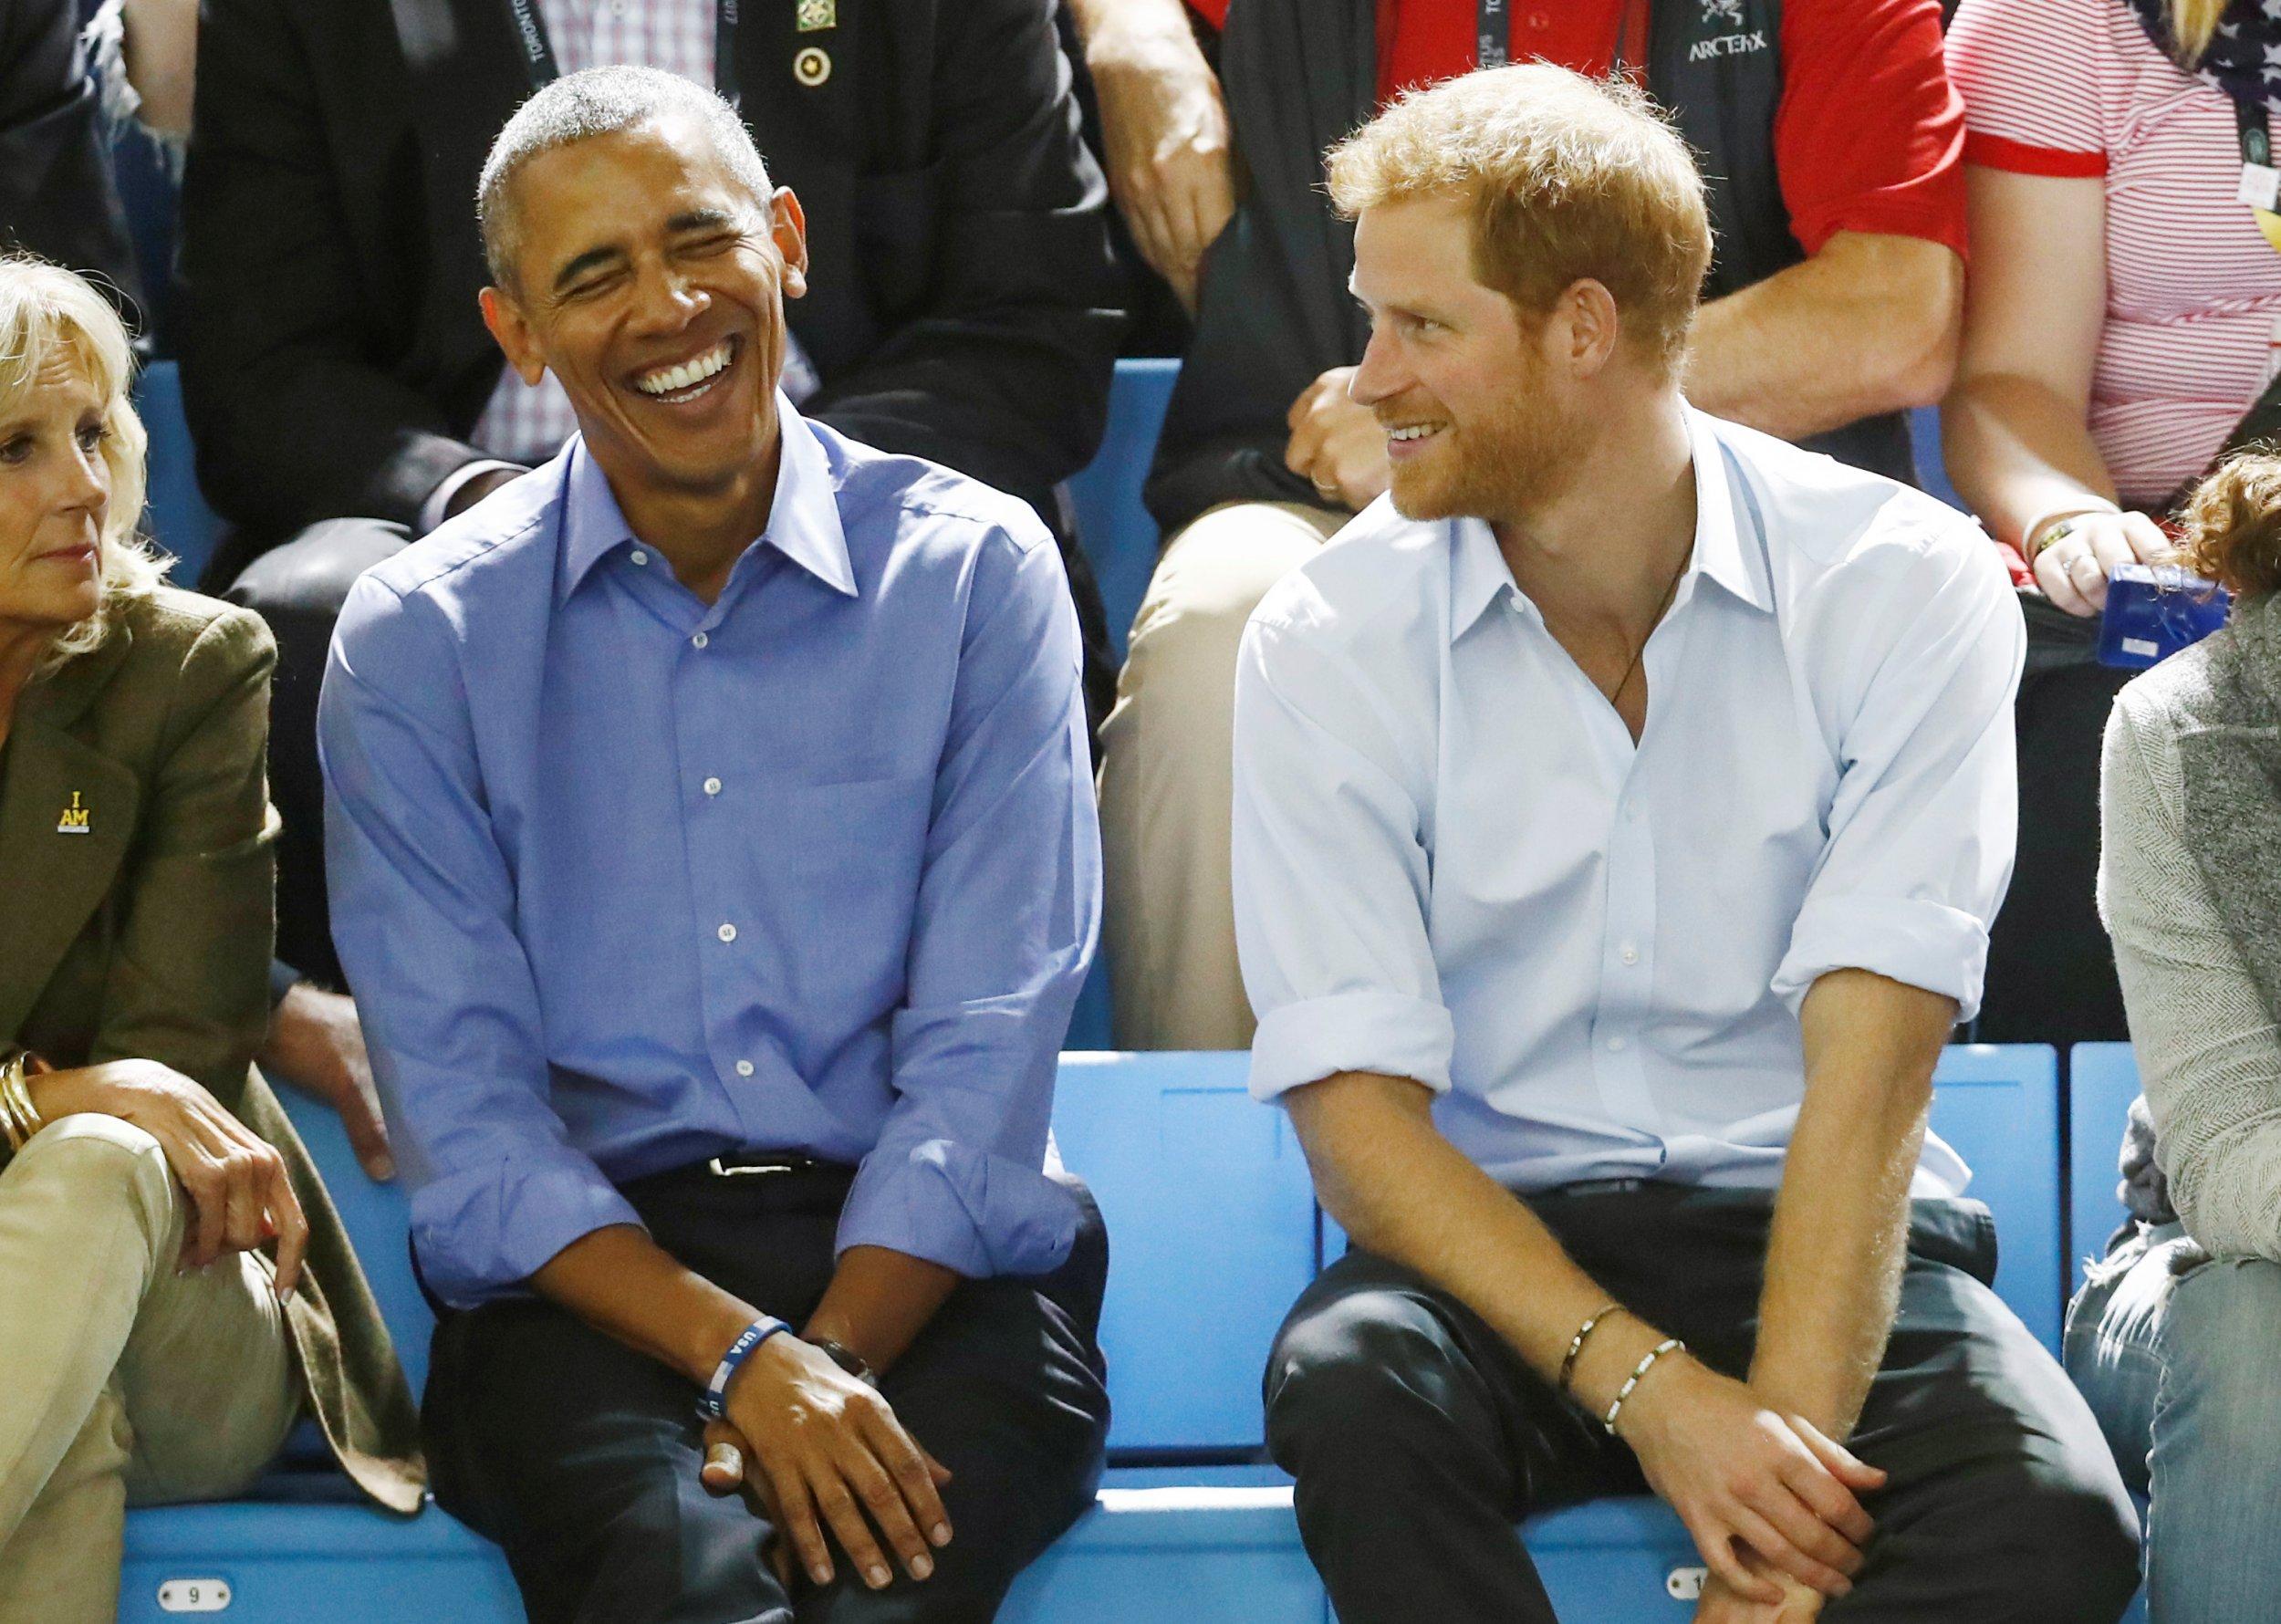 Obama Not Donald Trump May Be Invited to Royal Wedding